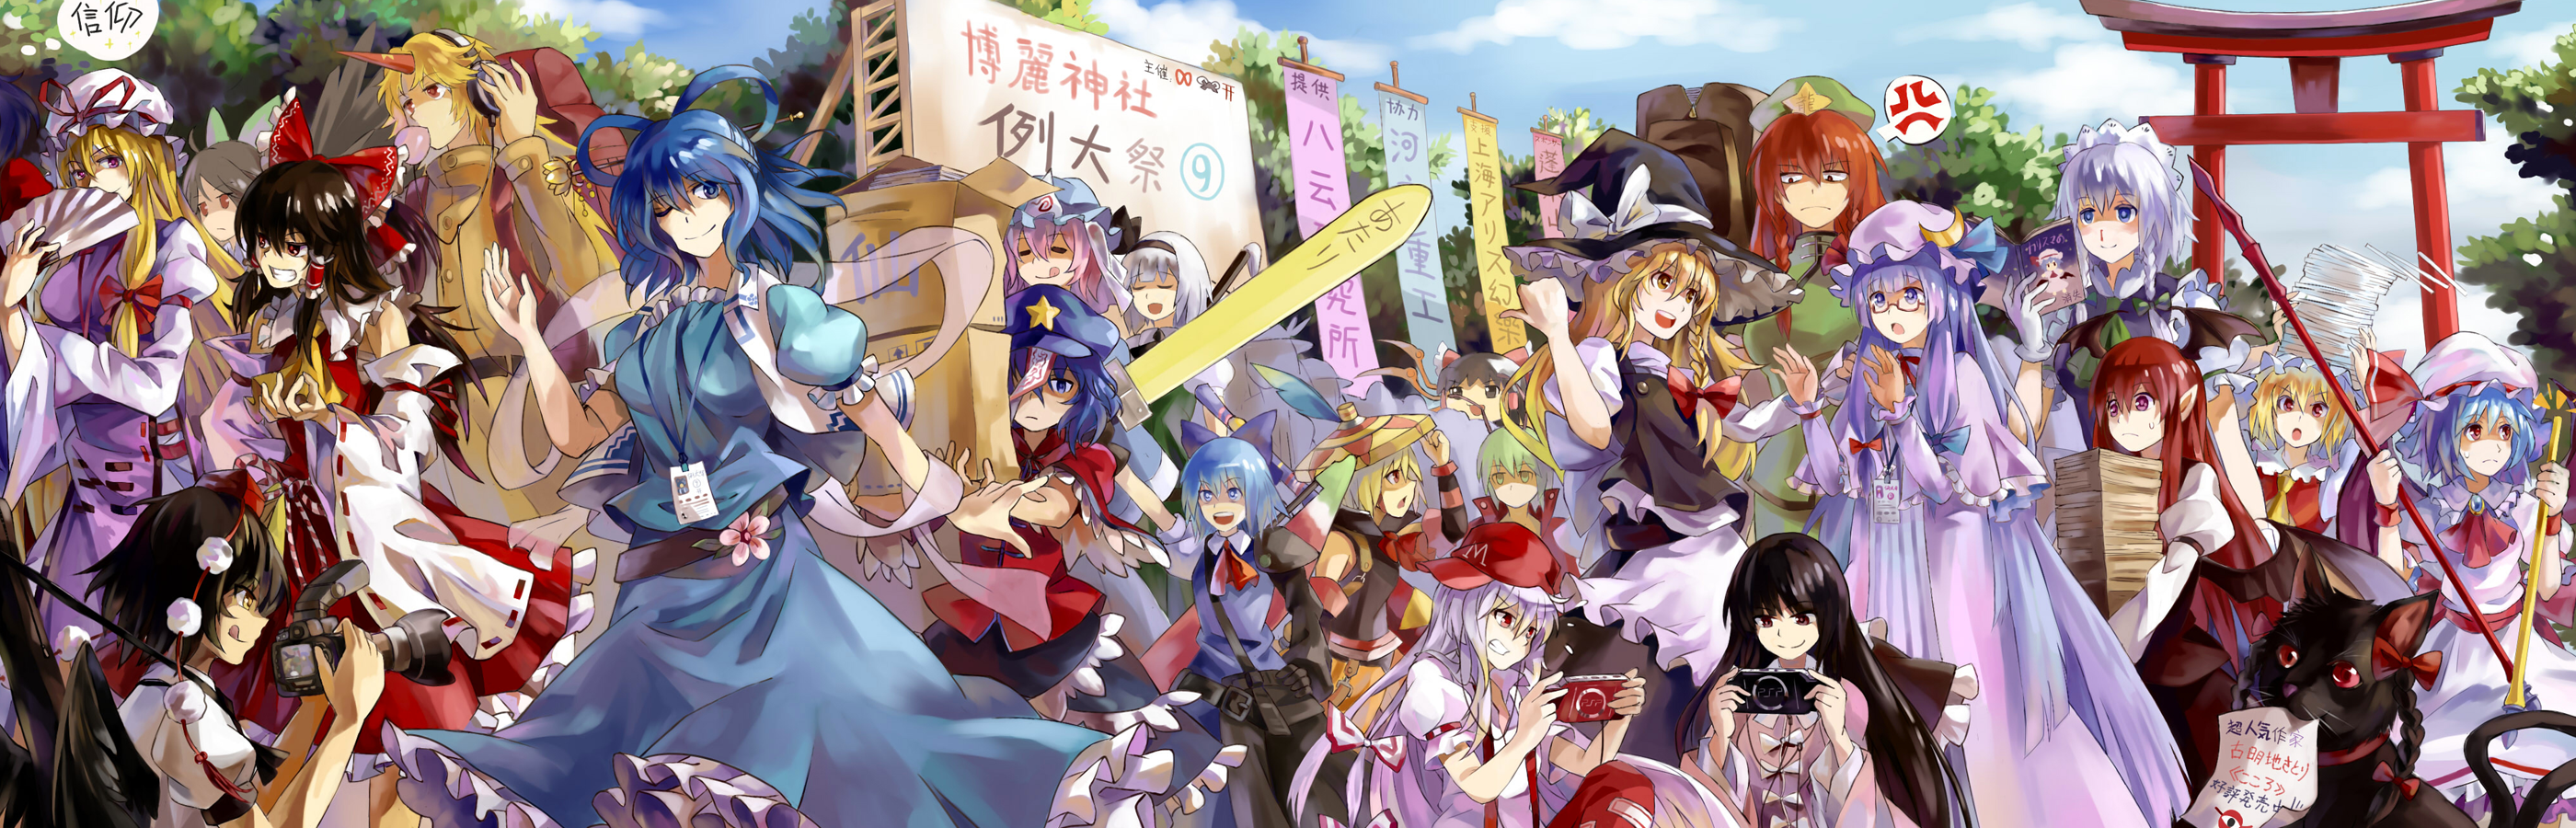 Anime Dual Monitor Wallpapers Top Free Anime Dual Monitor